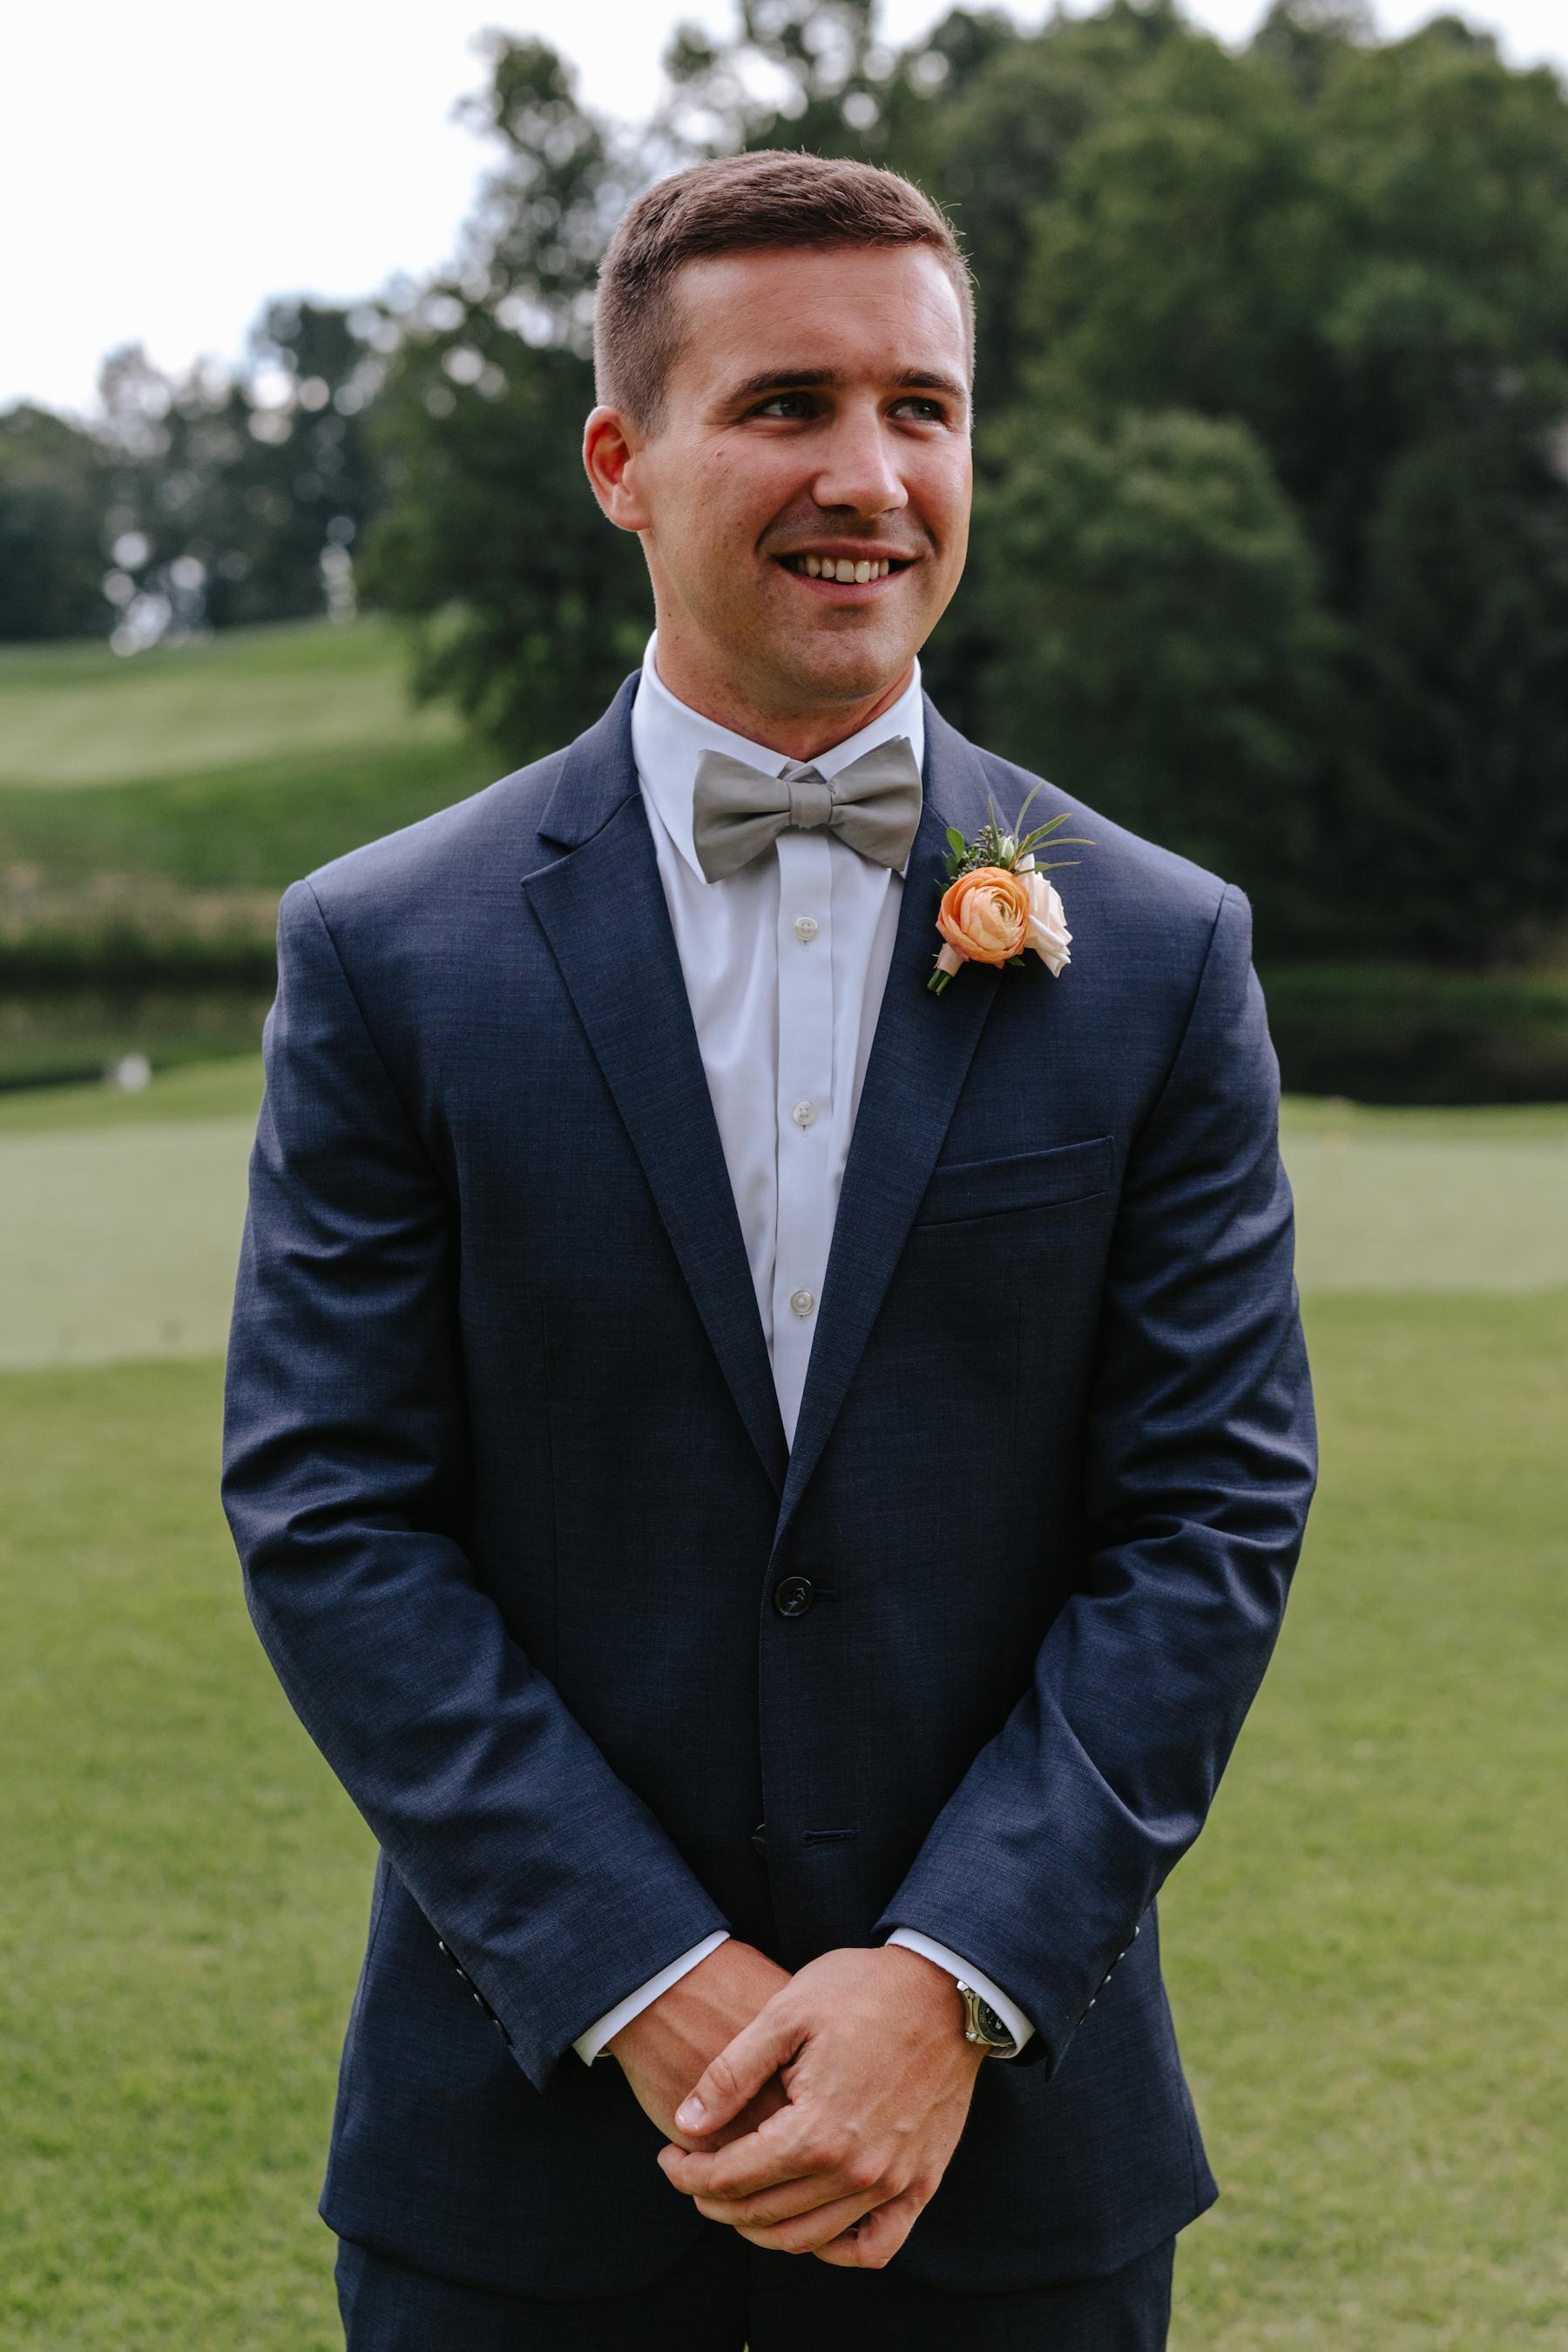 wedding-engagement-photographer-spartanburg-greenville-columbia-carolina-south-north-466.JPG